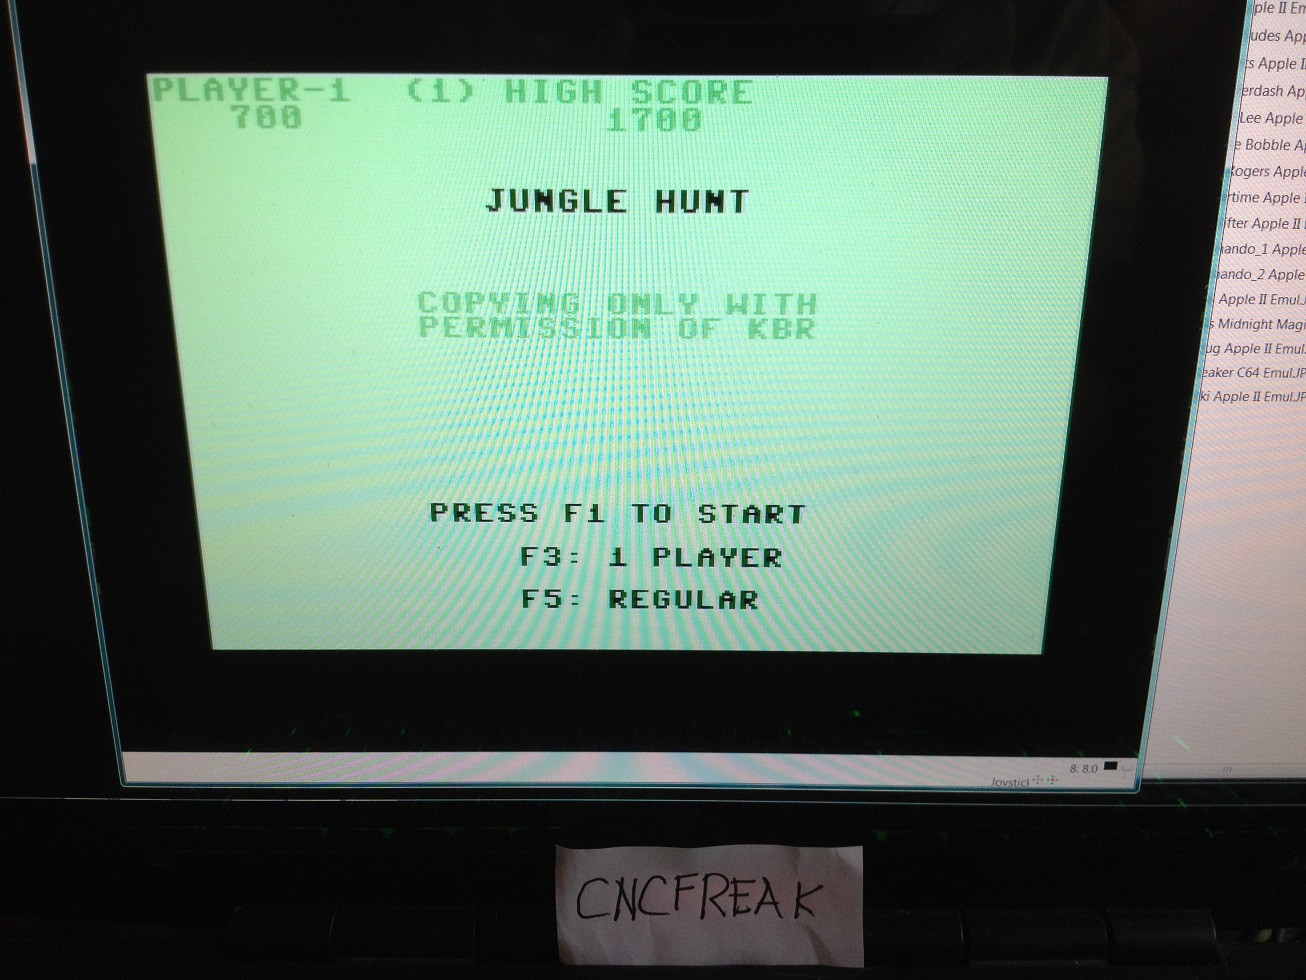 Jungle Hunt 1,700 points